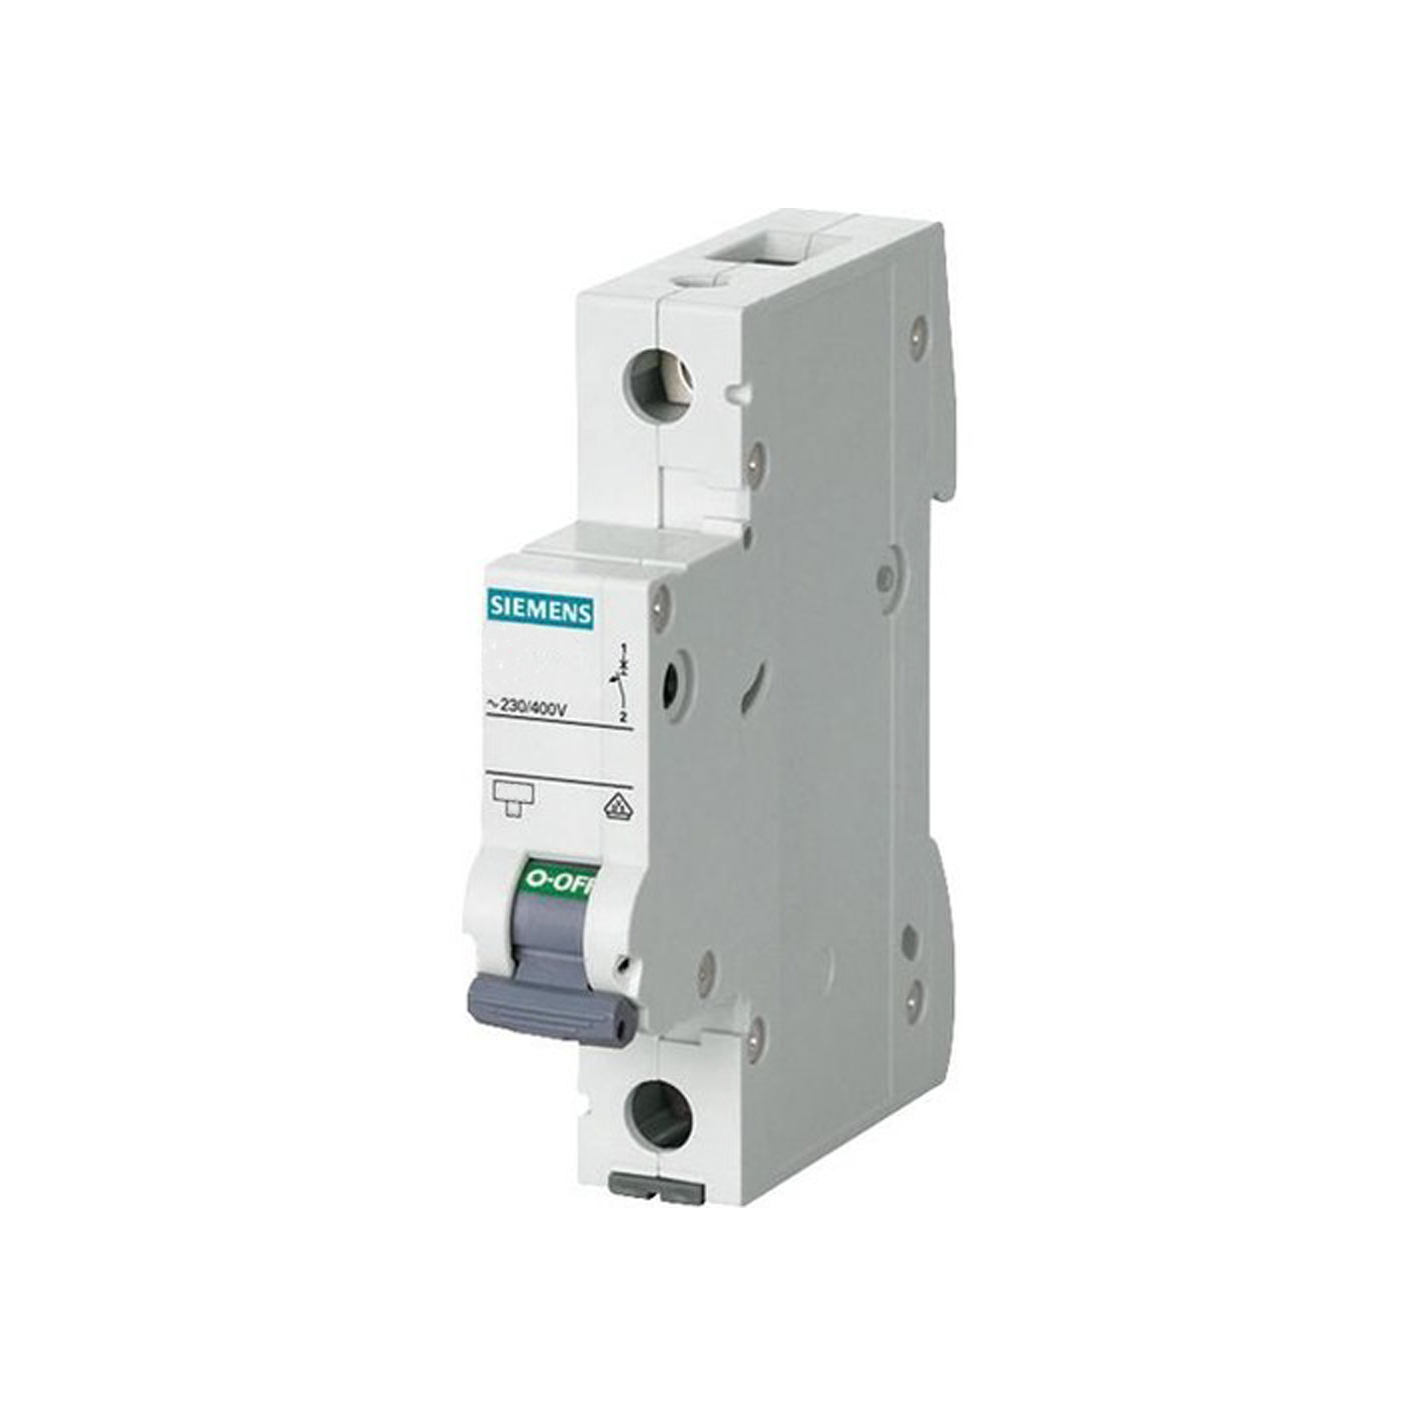 Siemens 1x20A Otomatik Sigorta